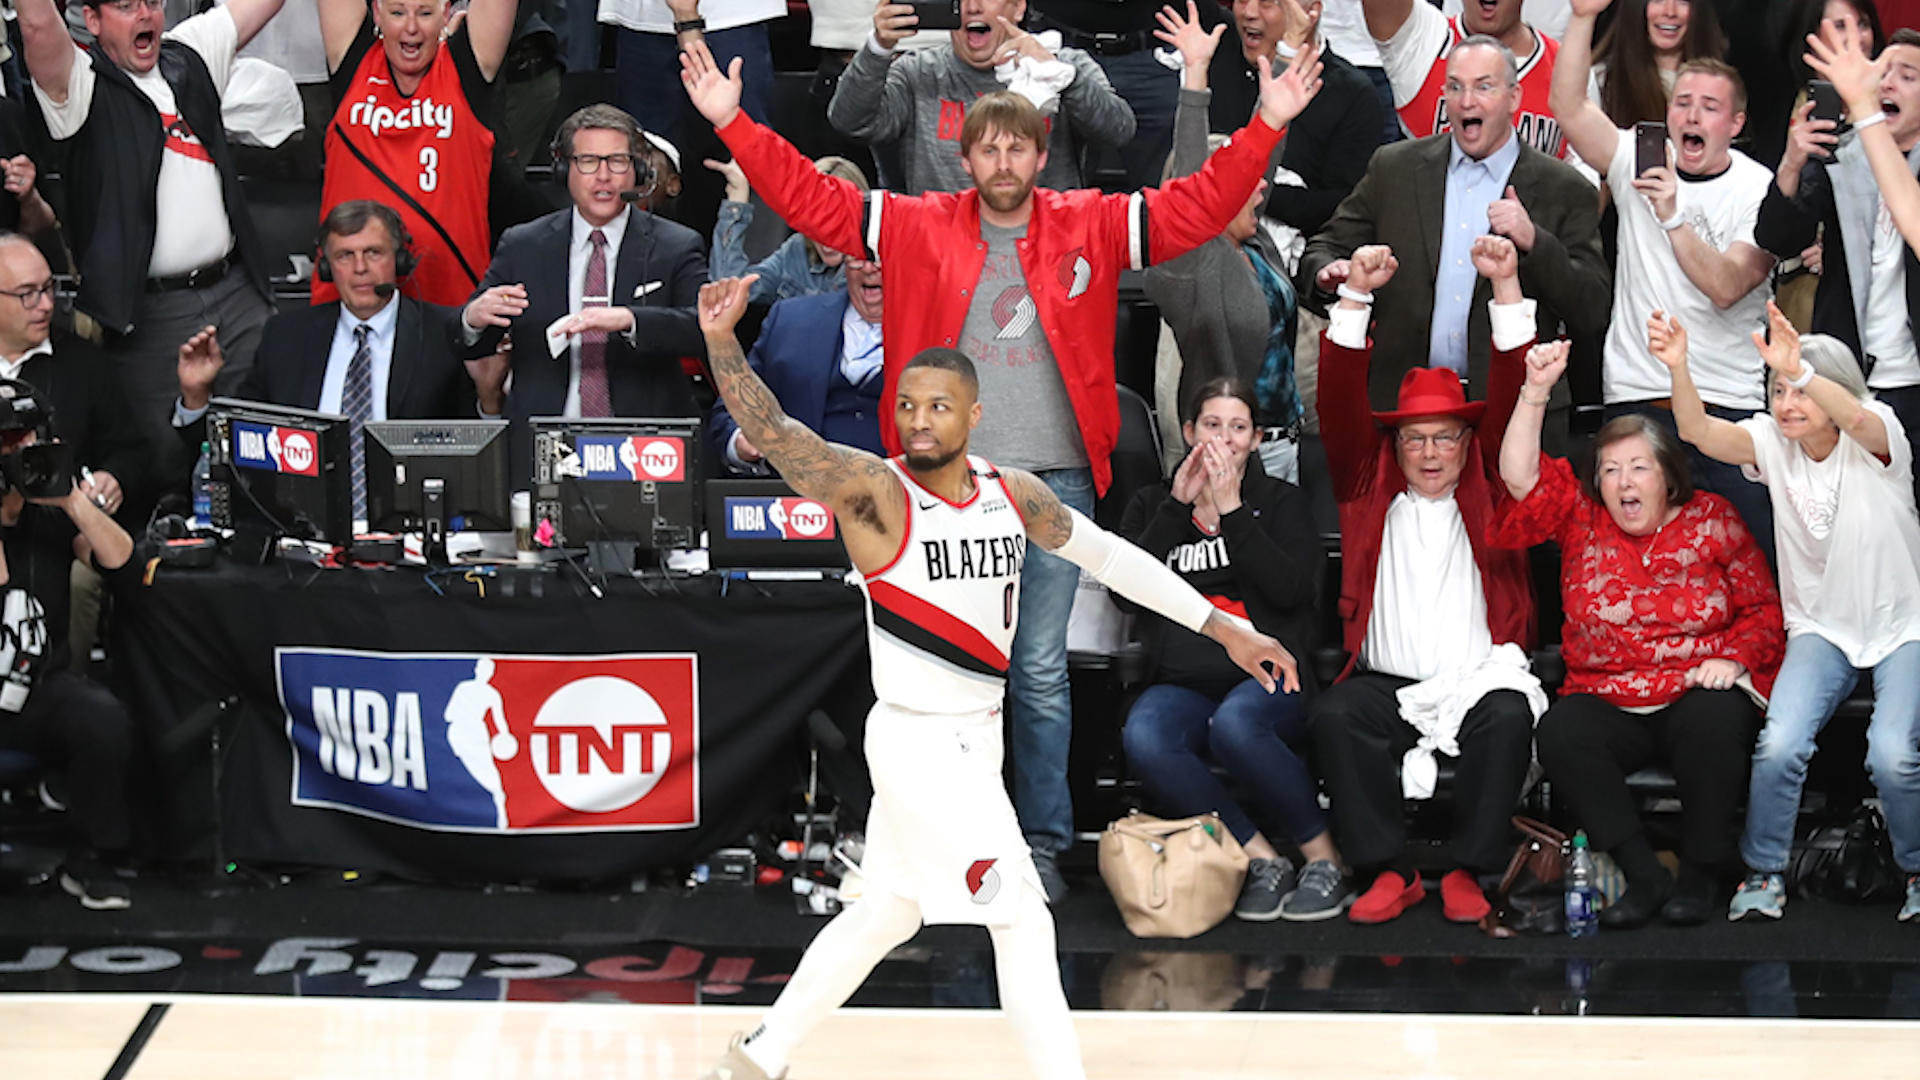 Damian Lillard emerges as star of NBA playoffs with game-winning, series-ending shot against Thunder